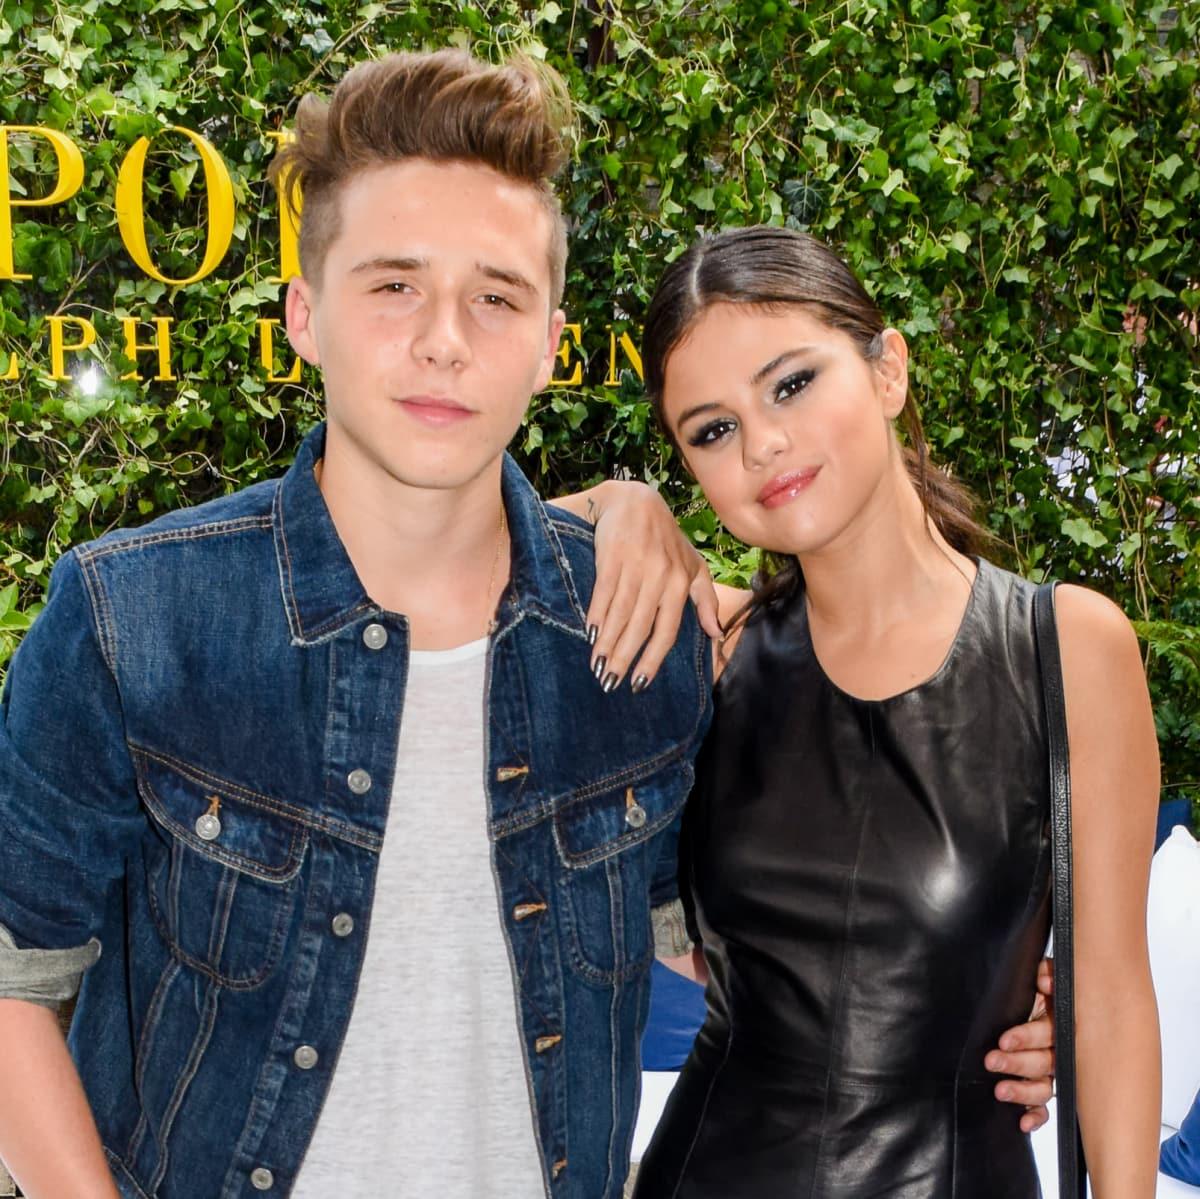 Brooklyn Beckham and Selena Gomez at Polo Ralph Lauren presentation at New York Fashion Week